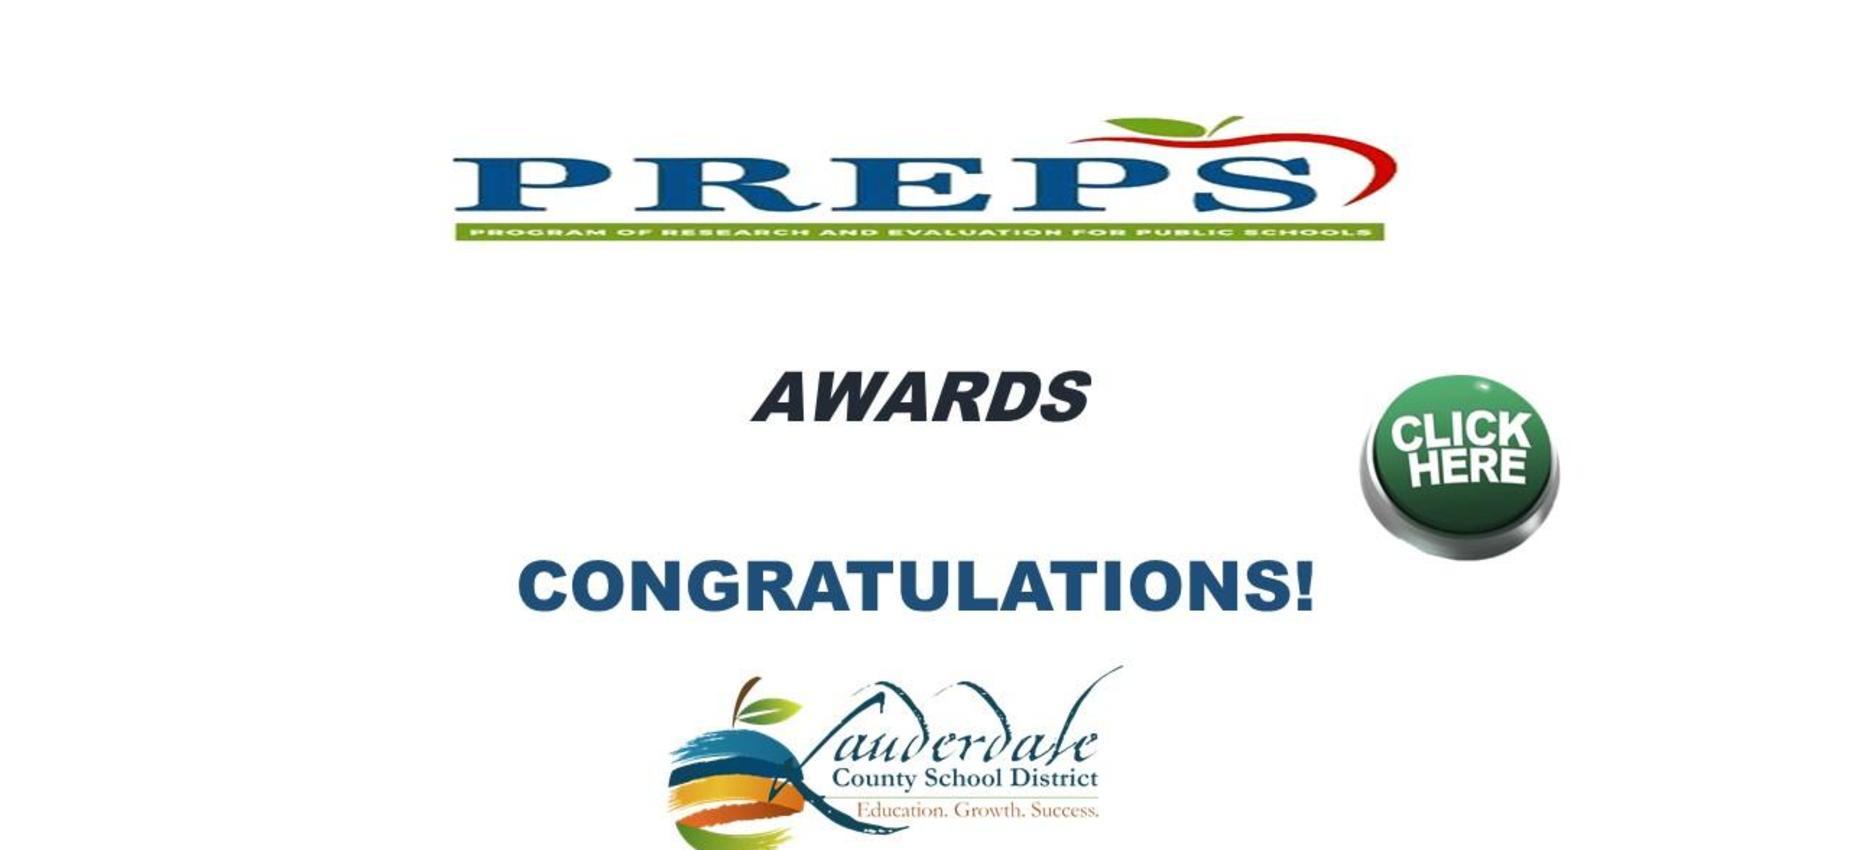 LCSDL PREPS Awards Graphic